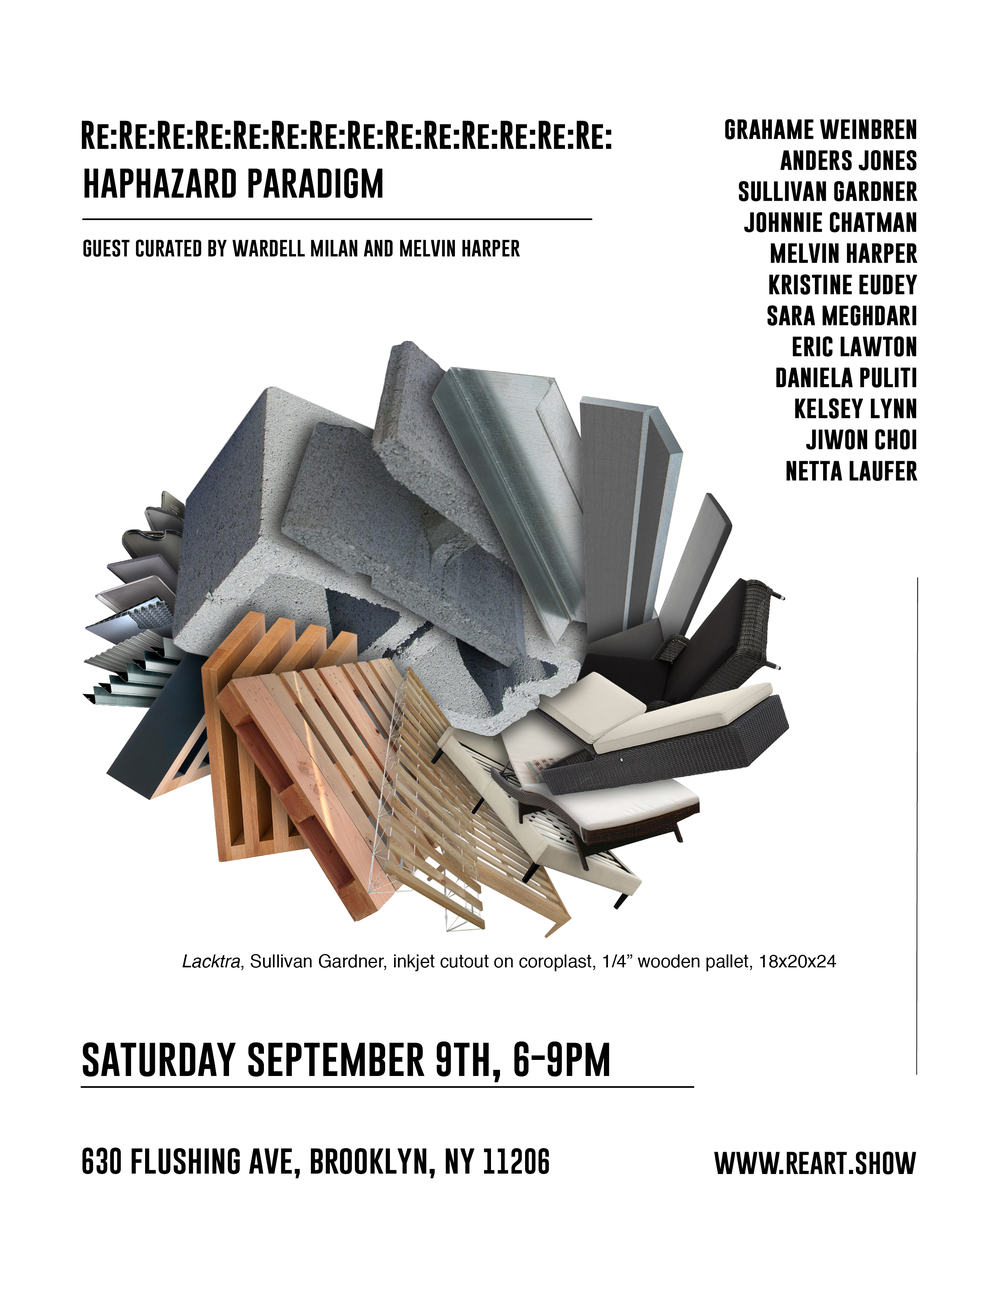 Exhibition: Haphazard Paradigm at Re:Art Show (Sep. 2017)